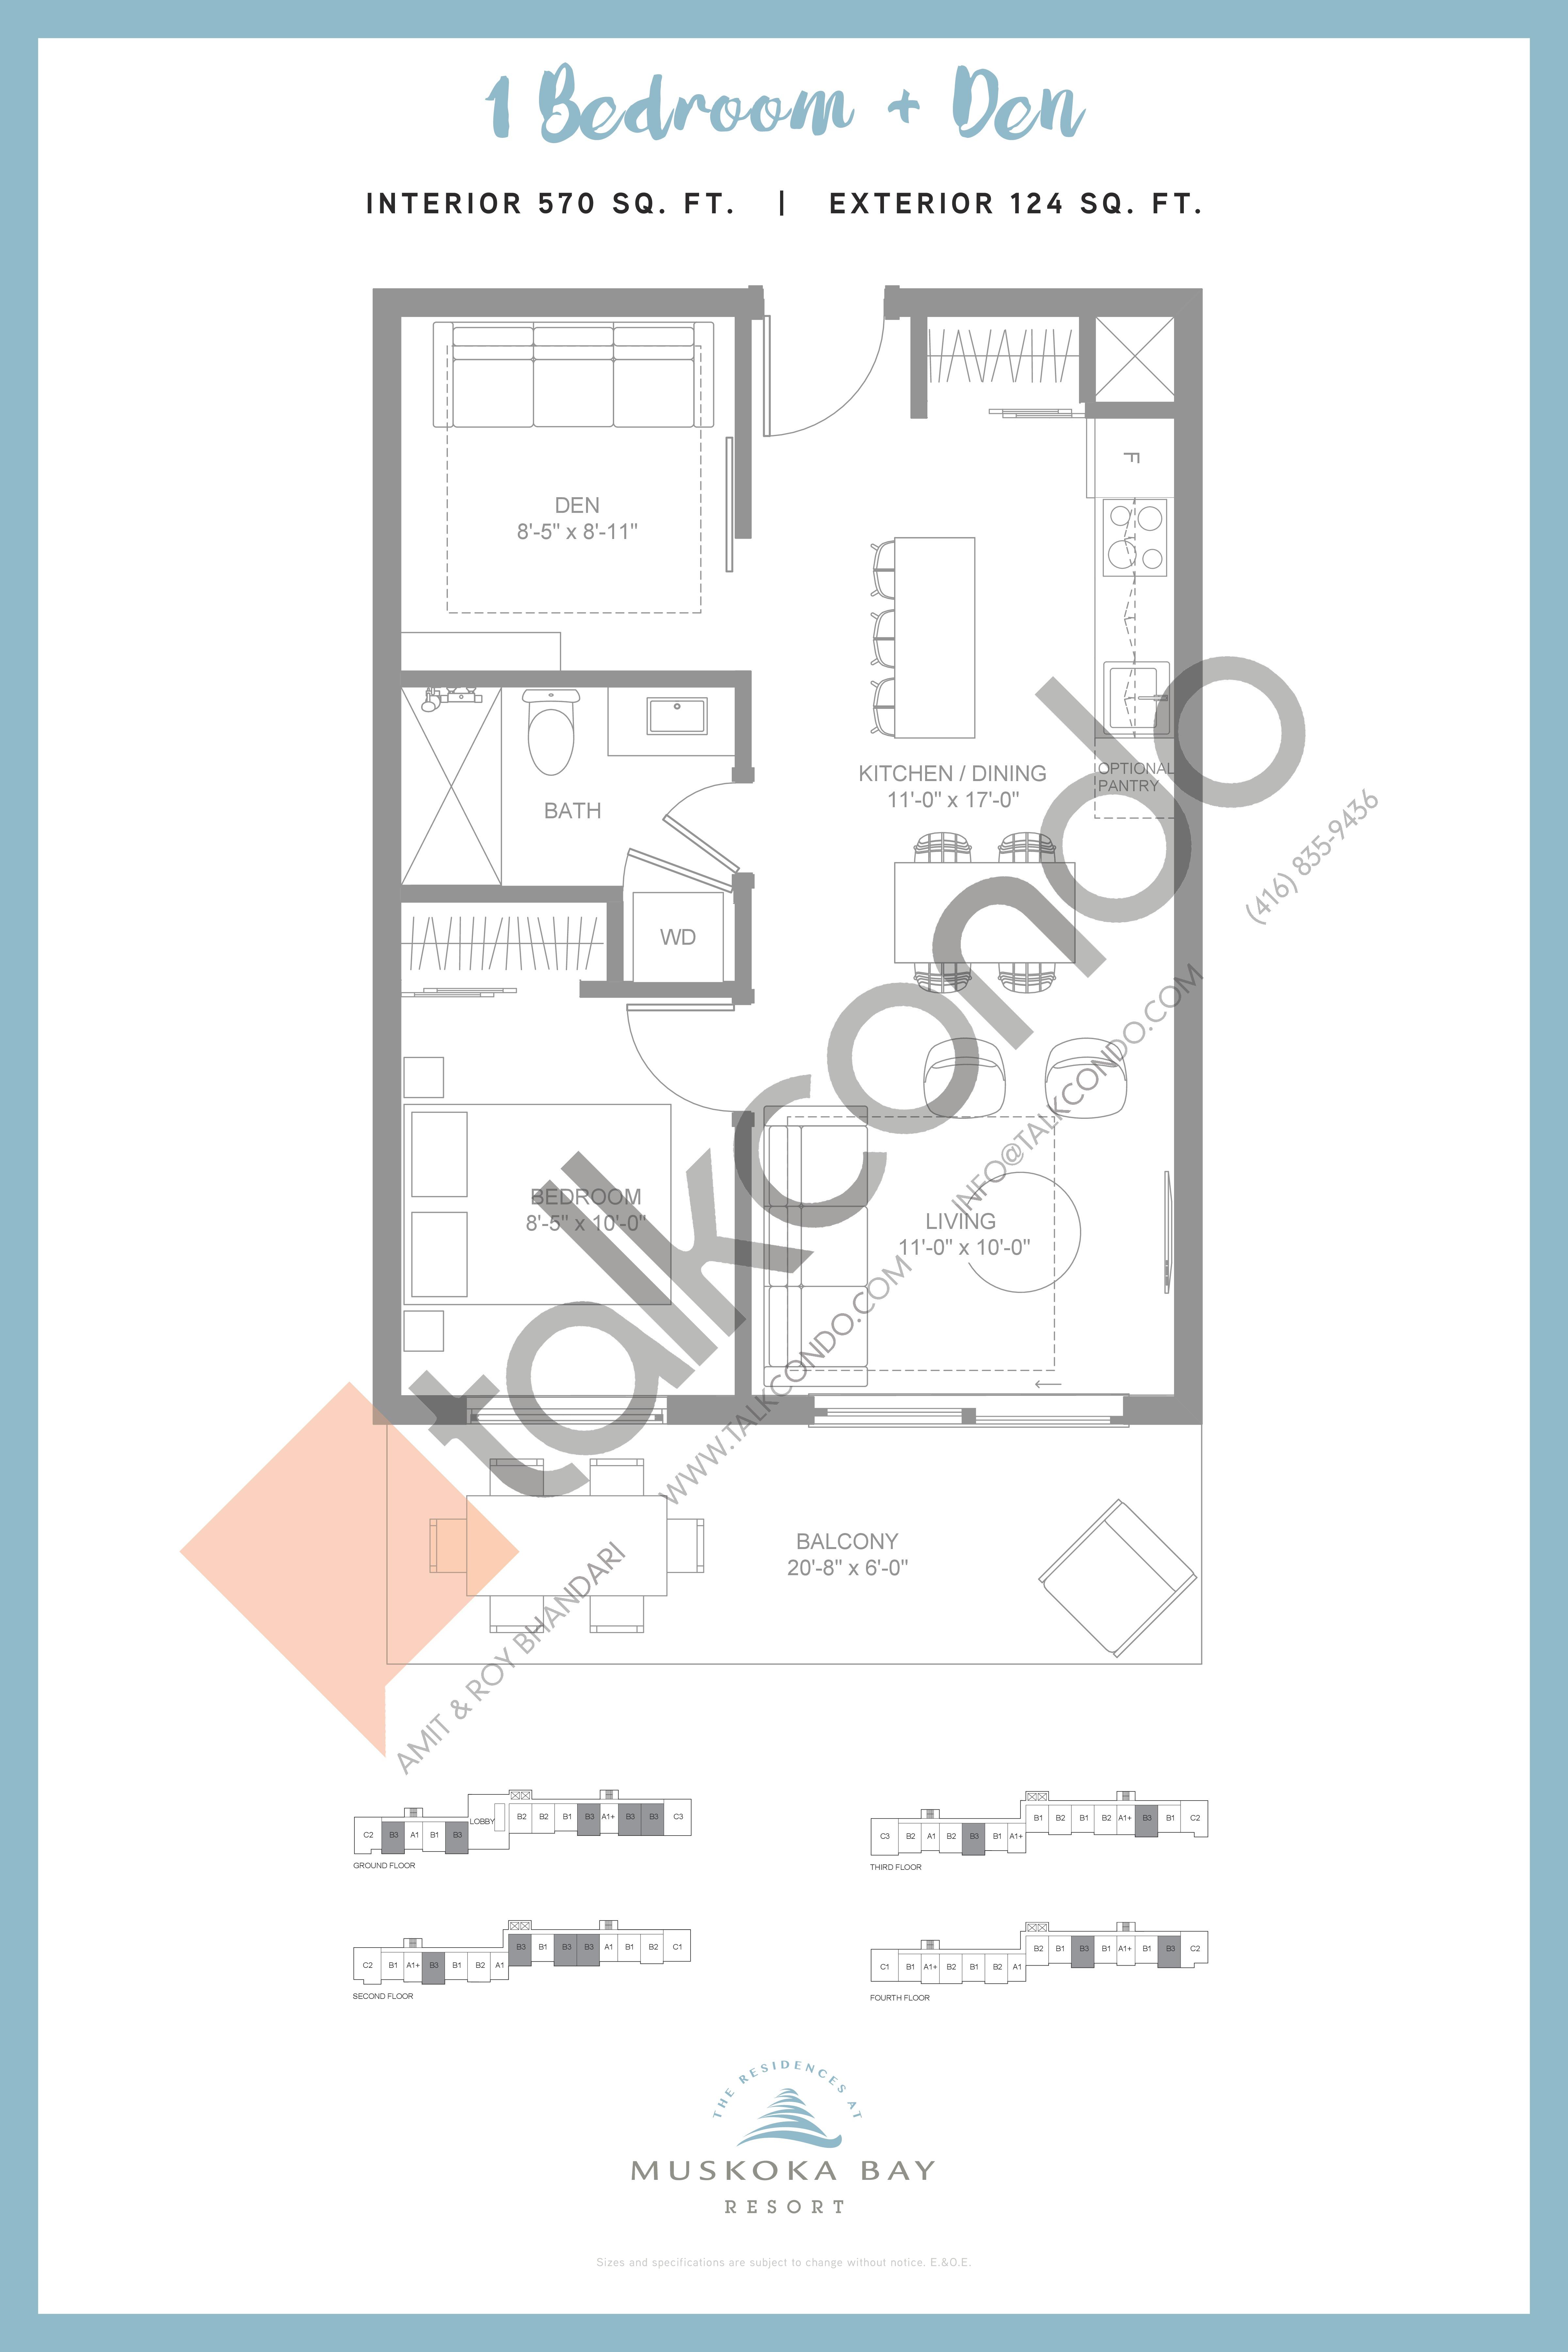 B3 (Suite Collection) Floor Plan at Muskoka Bay Resort - 570 sq.ft